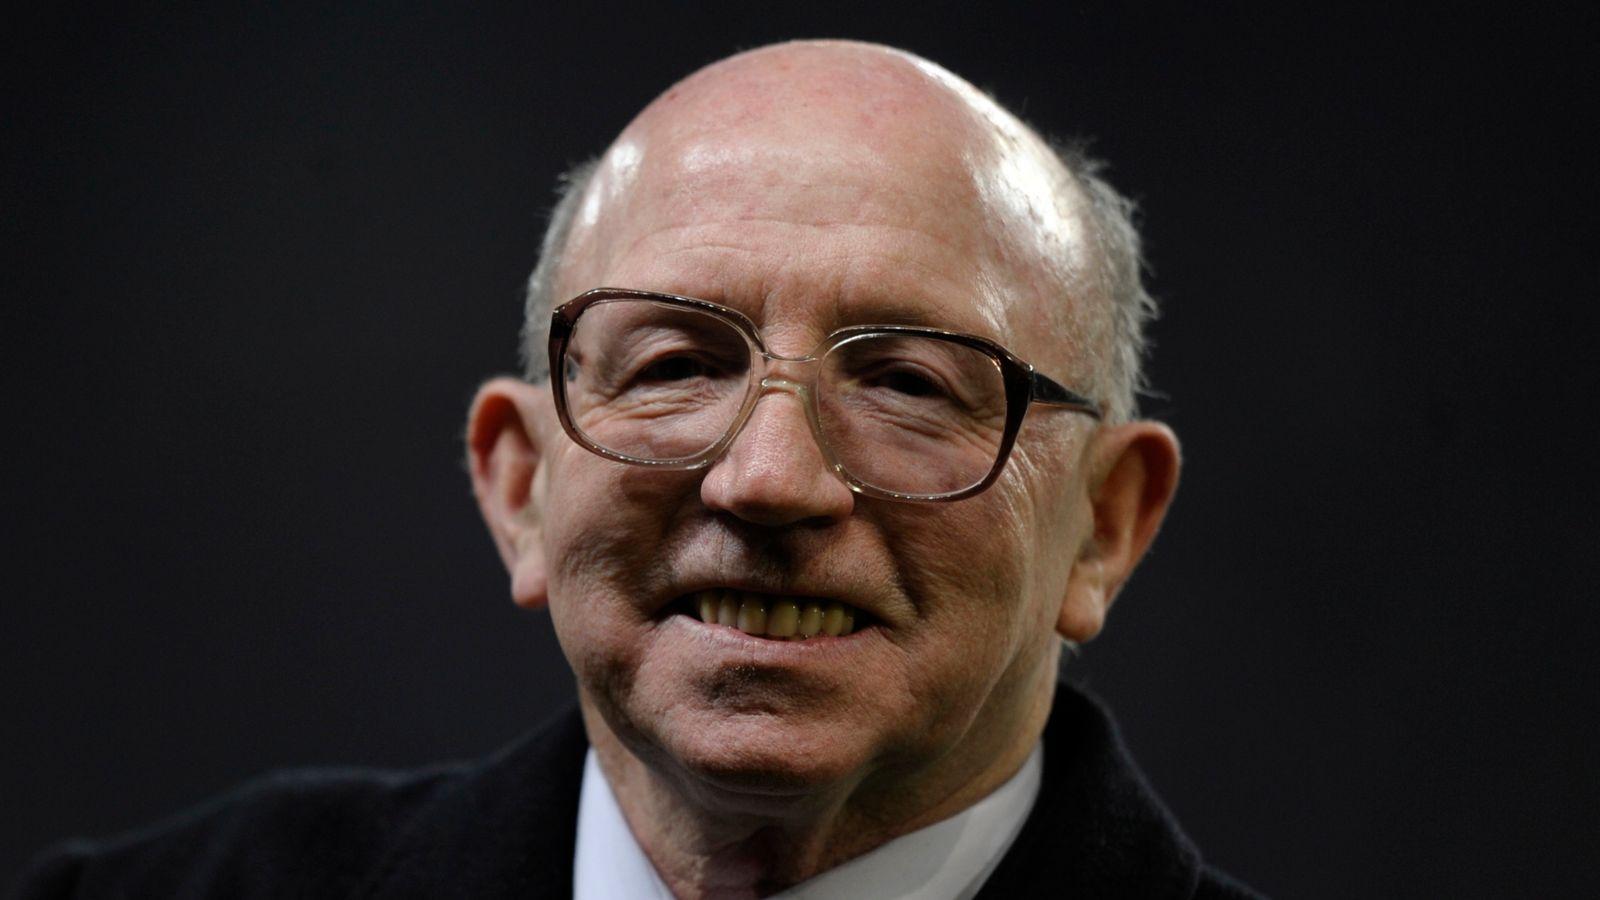 Nobby Stiles: Member of England's World Cup-winning team dies aged 78